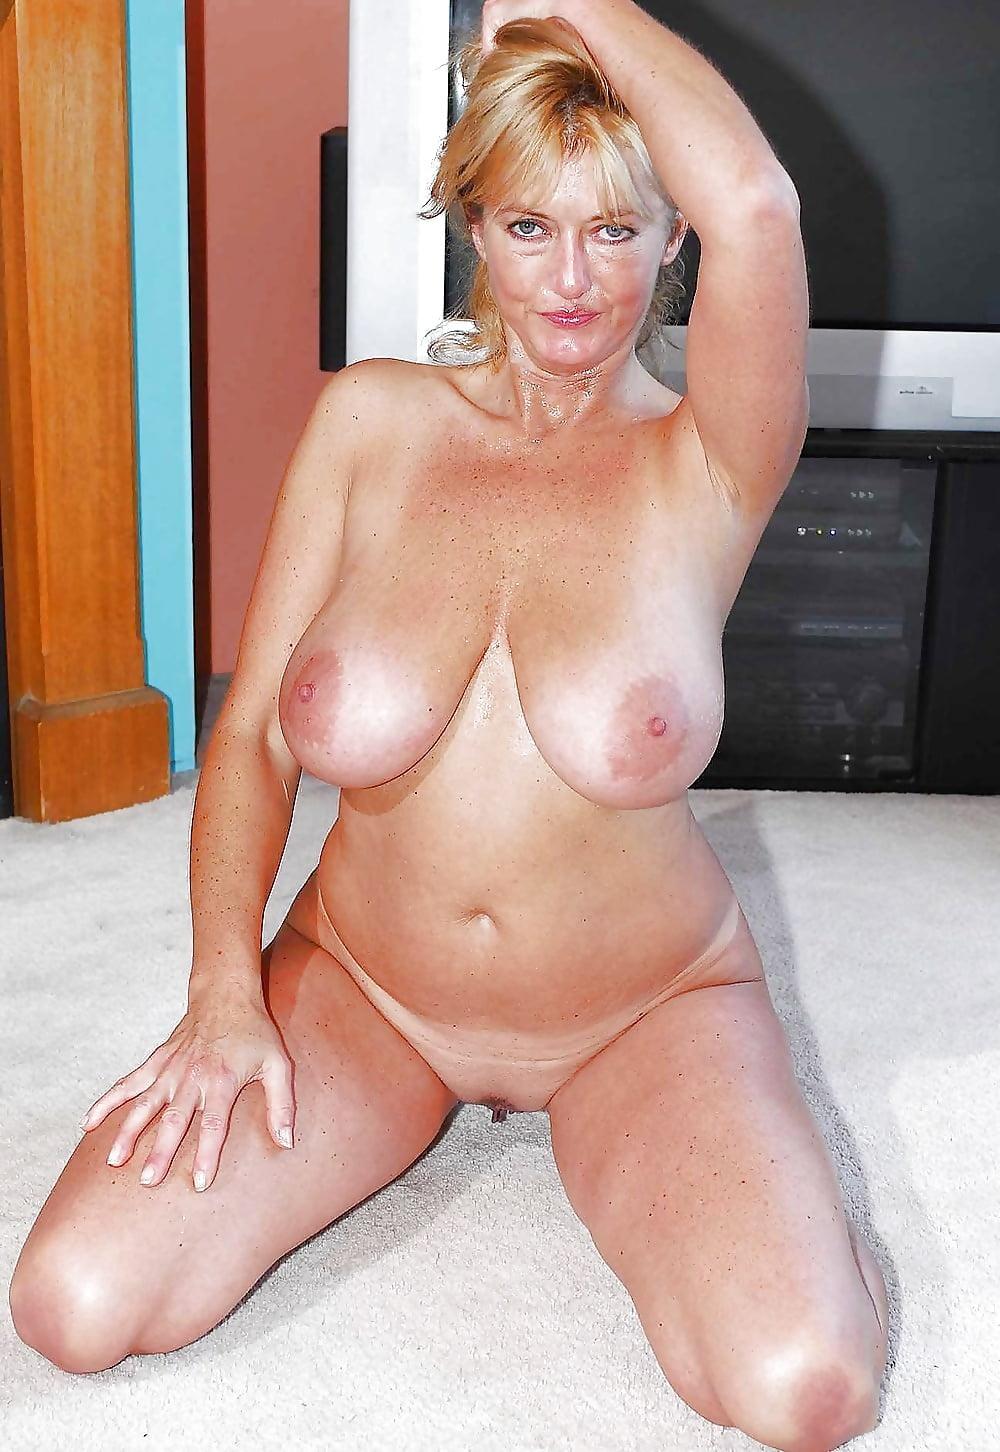 sister-masturbation-short-busty-mature-nudes